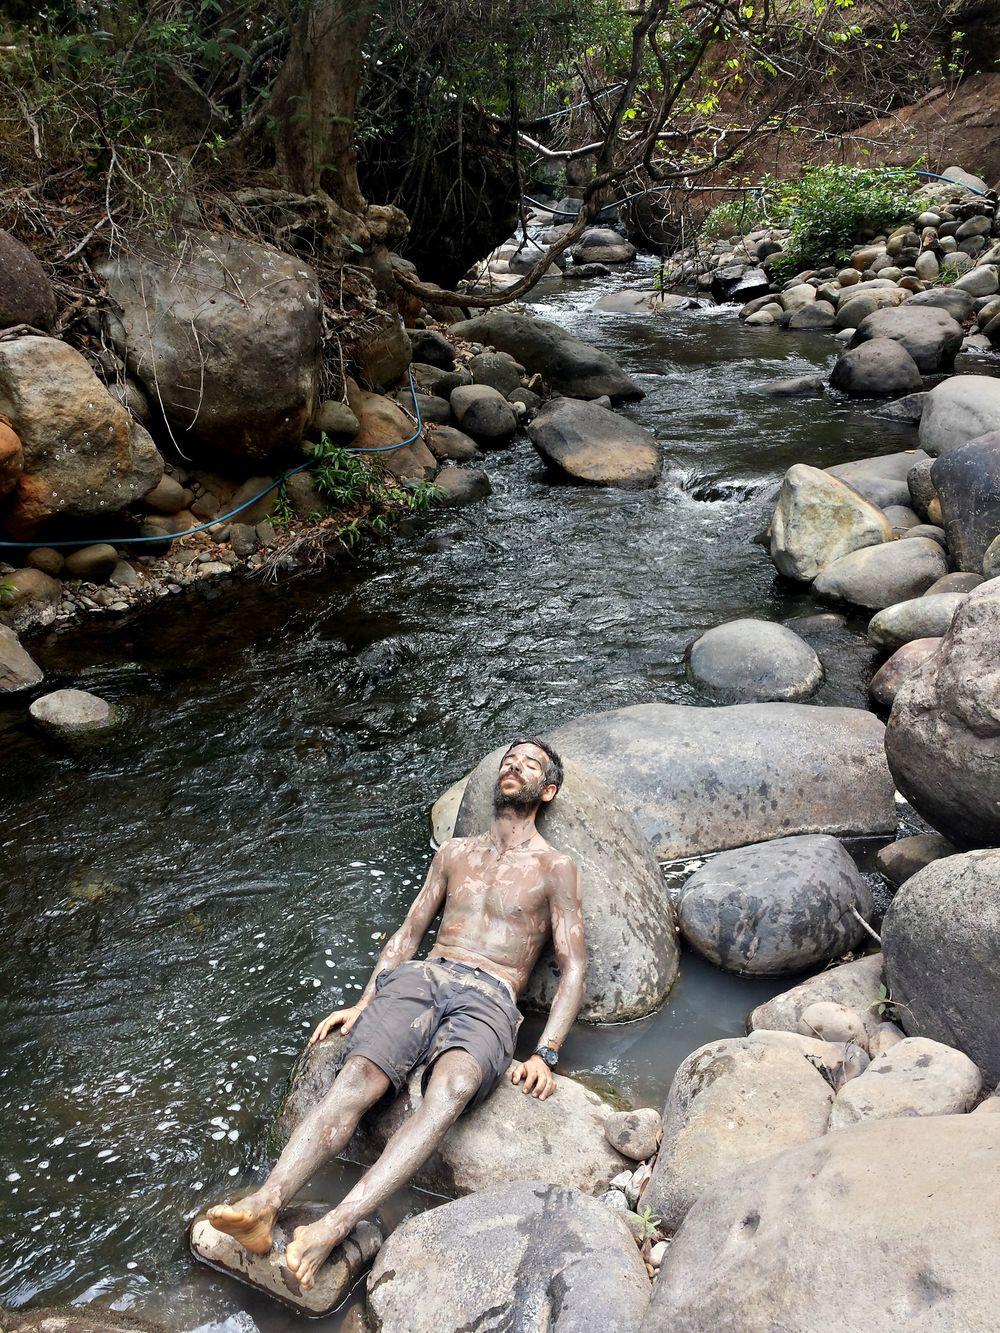 Soin de boue, Rincon de la Vieja, Guanacaste, Costa Rica